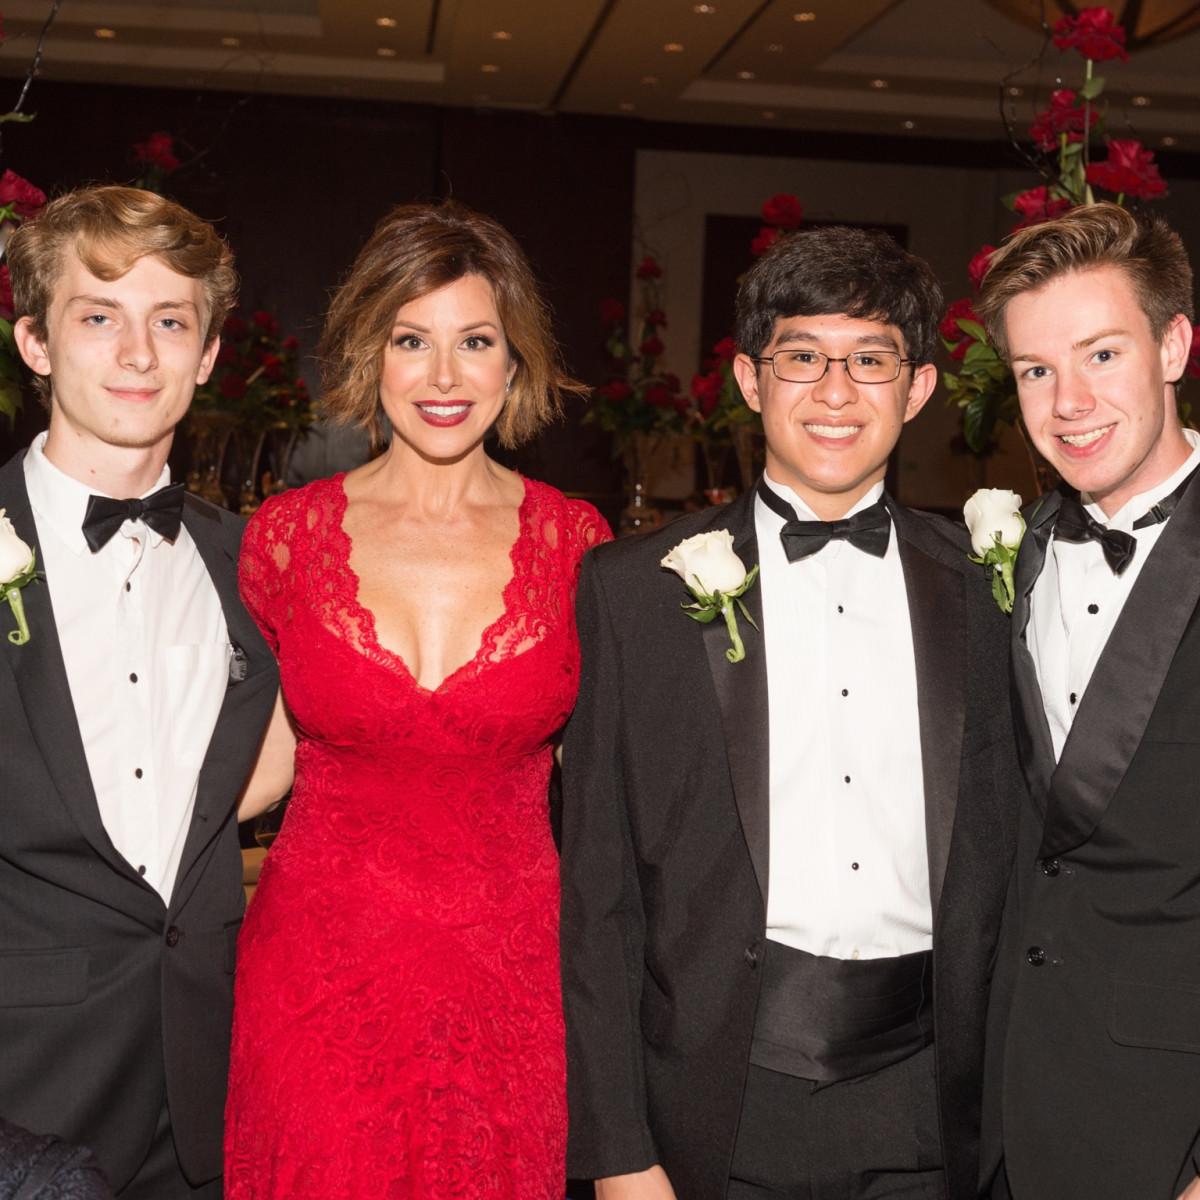 Dominique Sachse with Virtuosi students at Virtuosi Gala